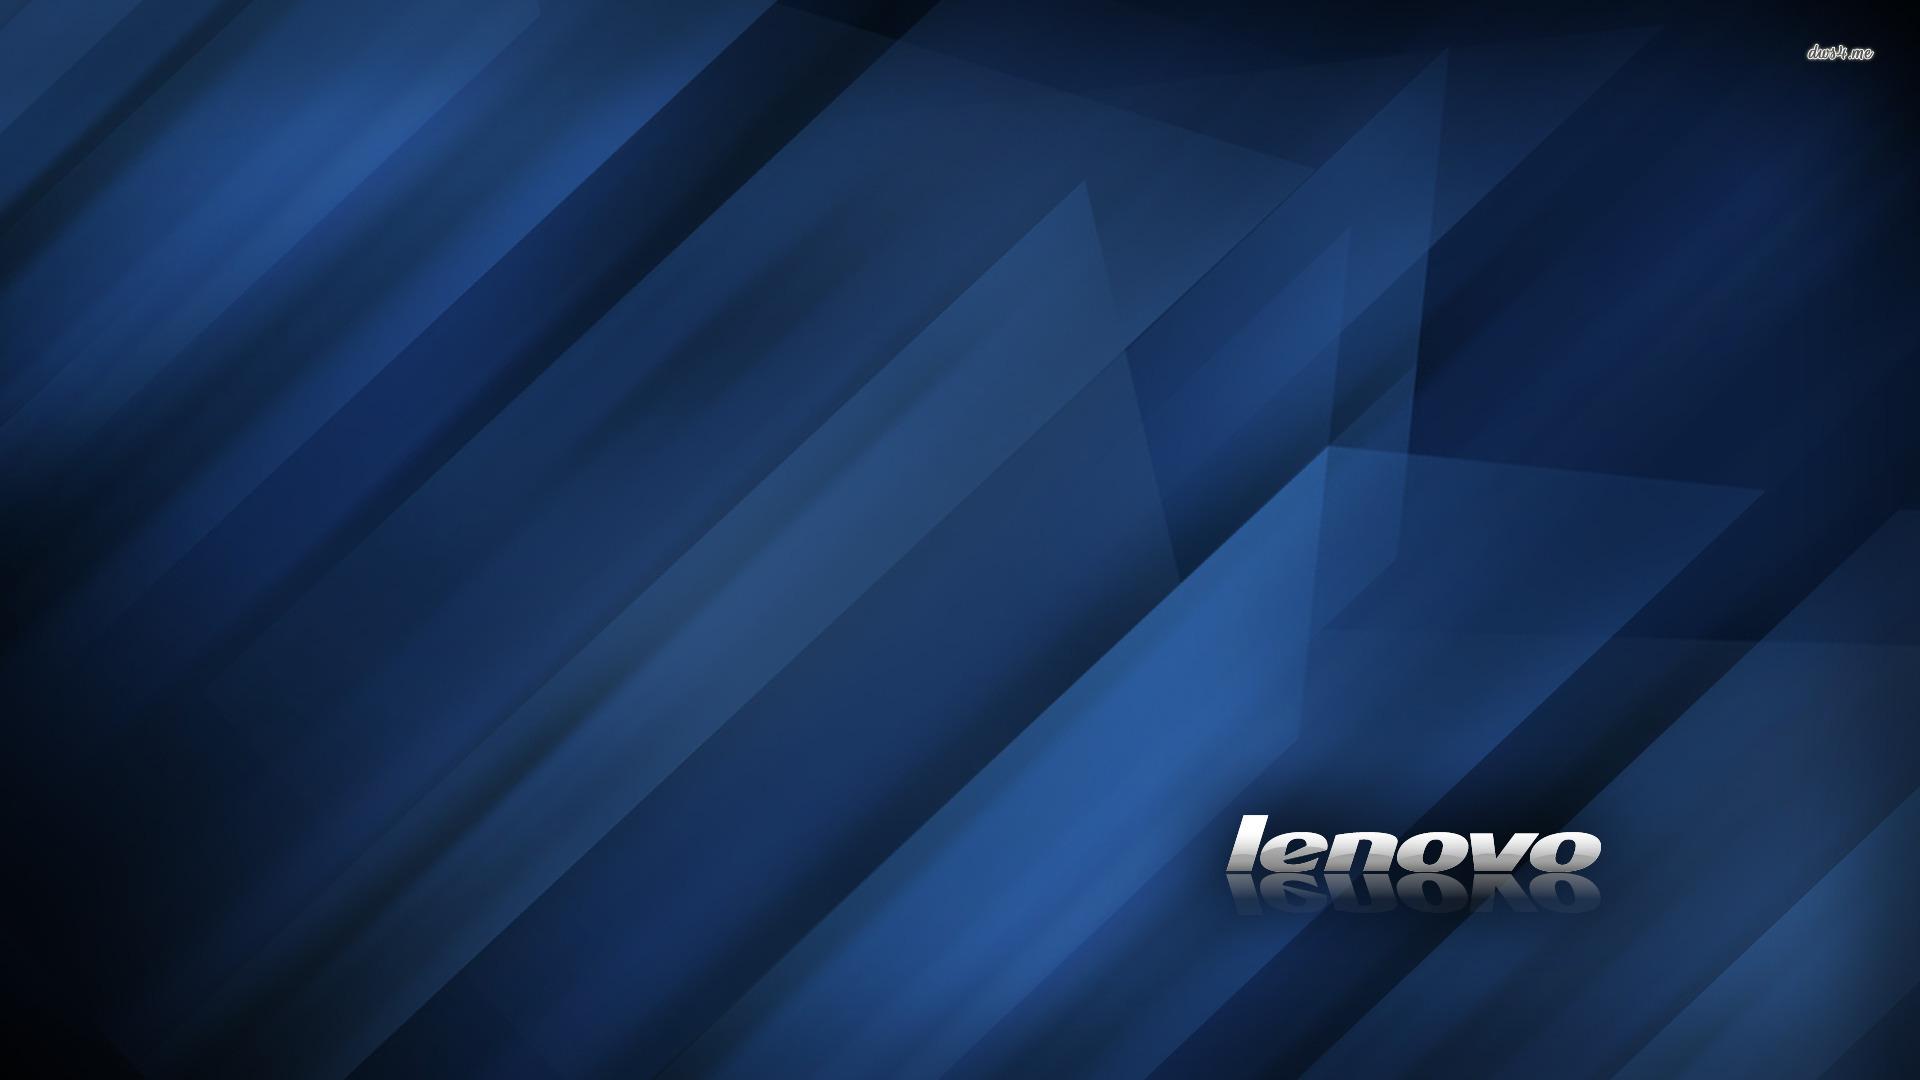 Lenovo wallpaper   Computer wallpapers   13750 1920x1080